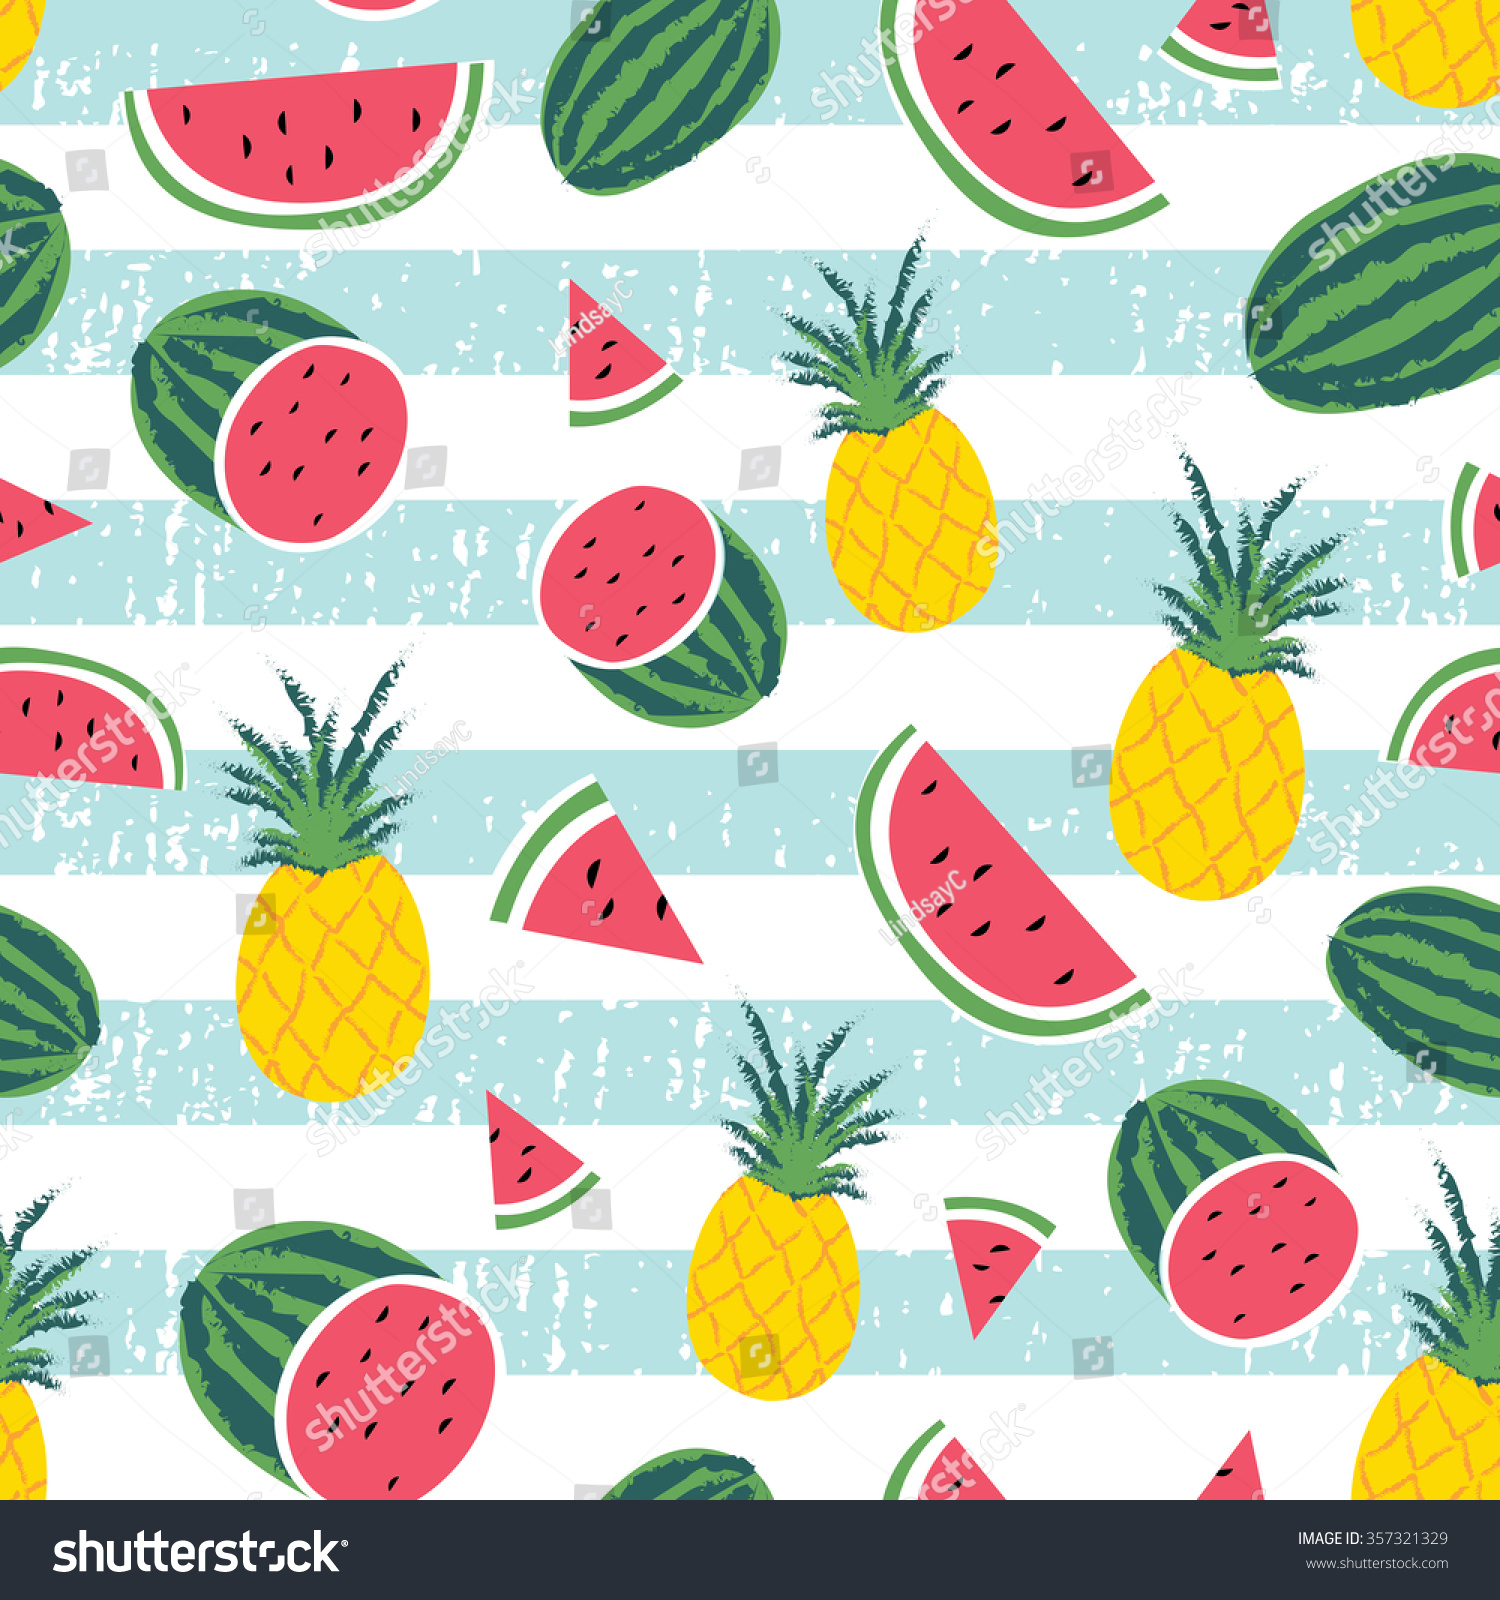 Vintage Pineapple Wallpaper Patterns